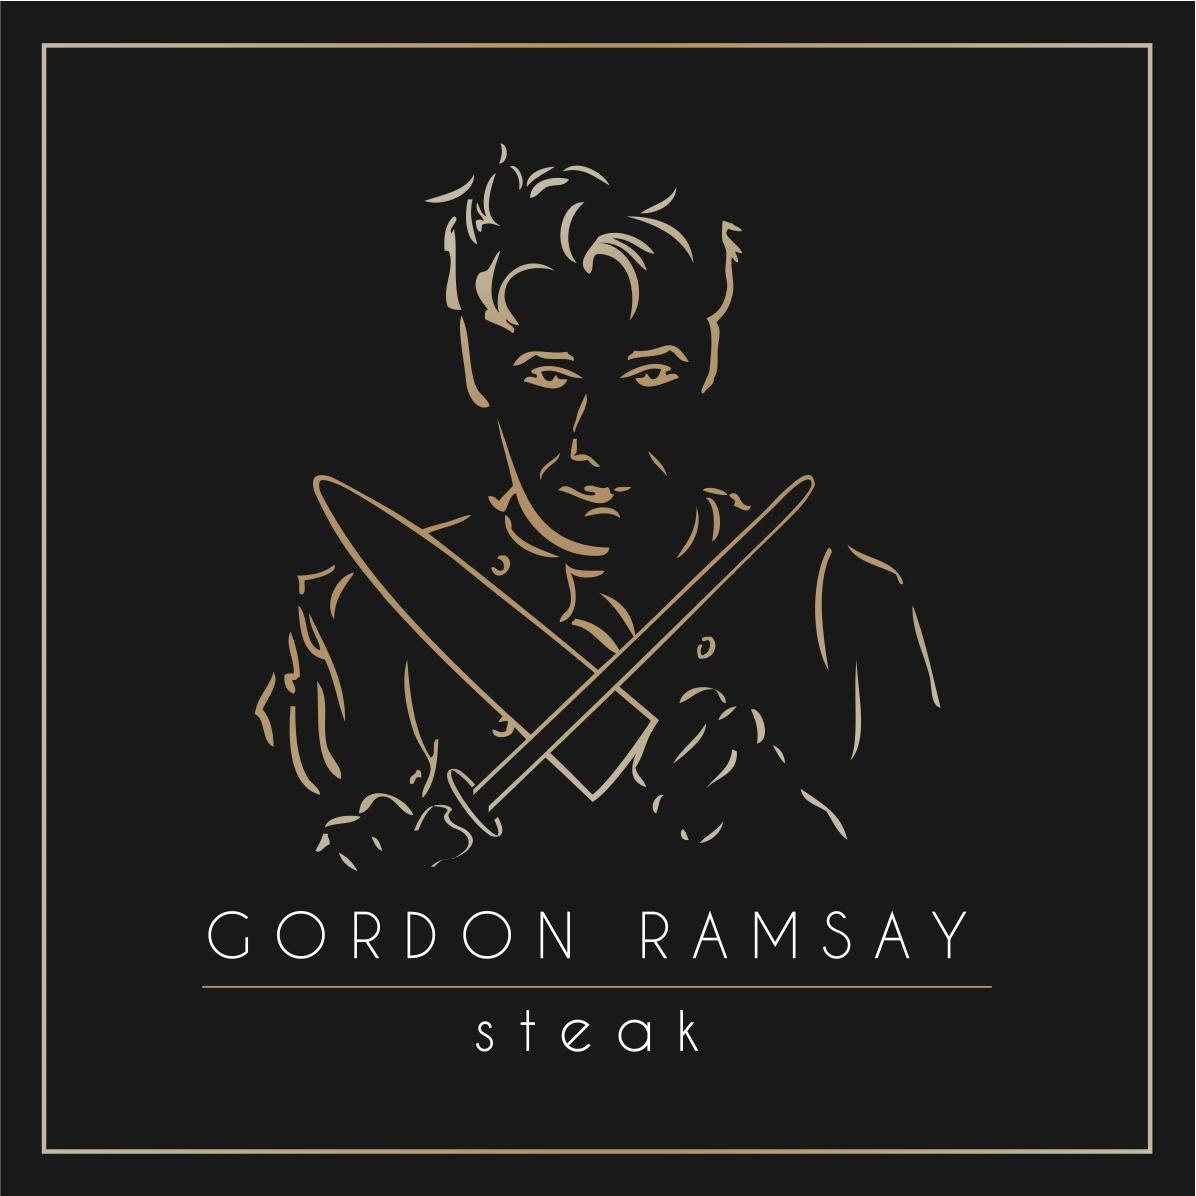 Gordon Ramsay Steak - Atlantic City, NJ 08401 - (609)441-5060 | ShowMeLocal.com